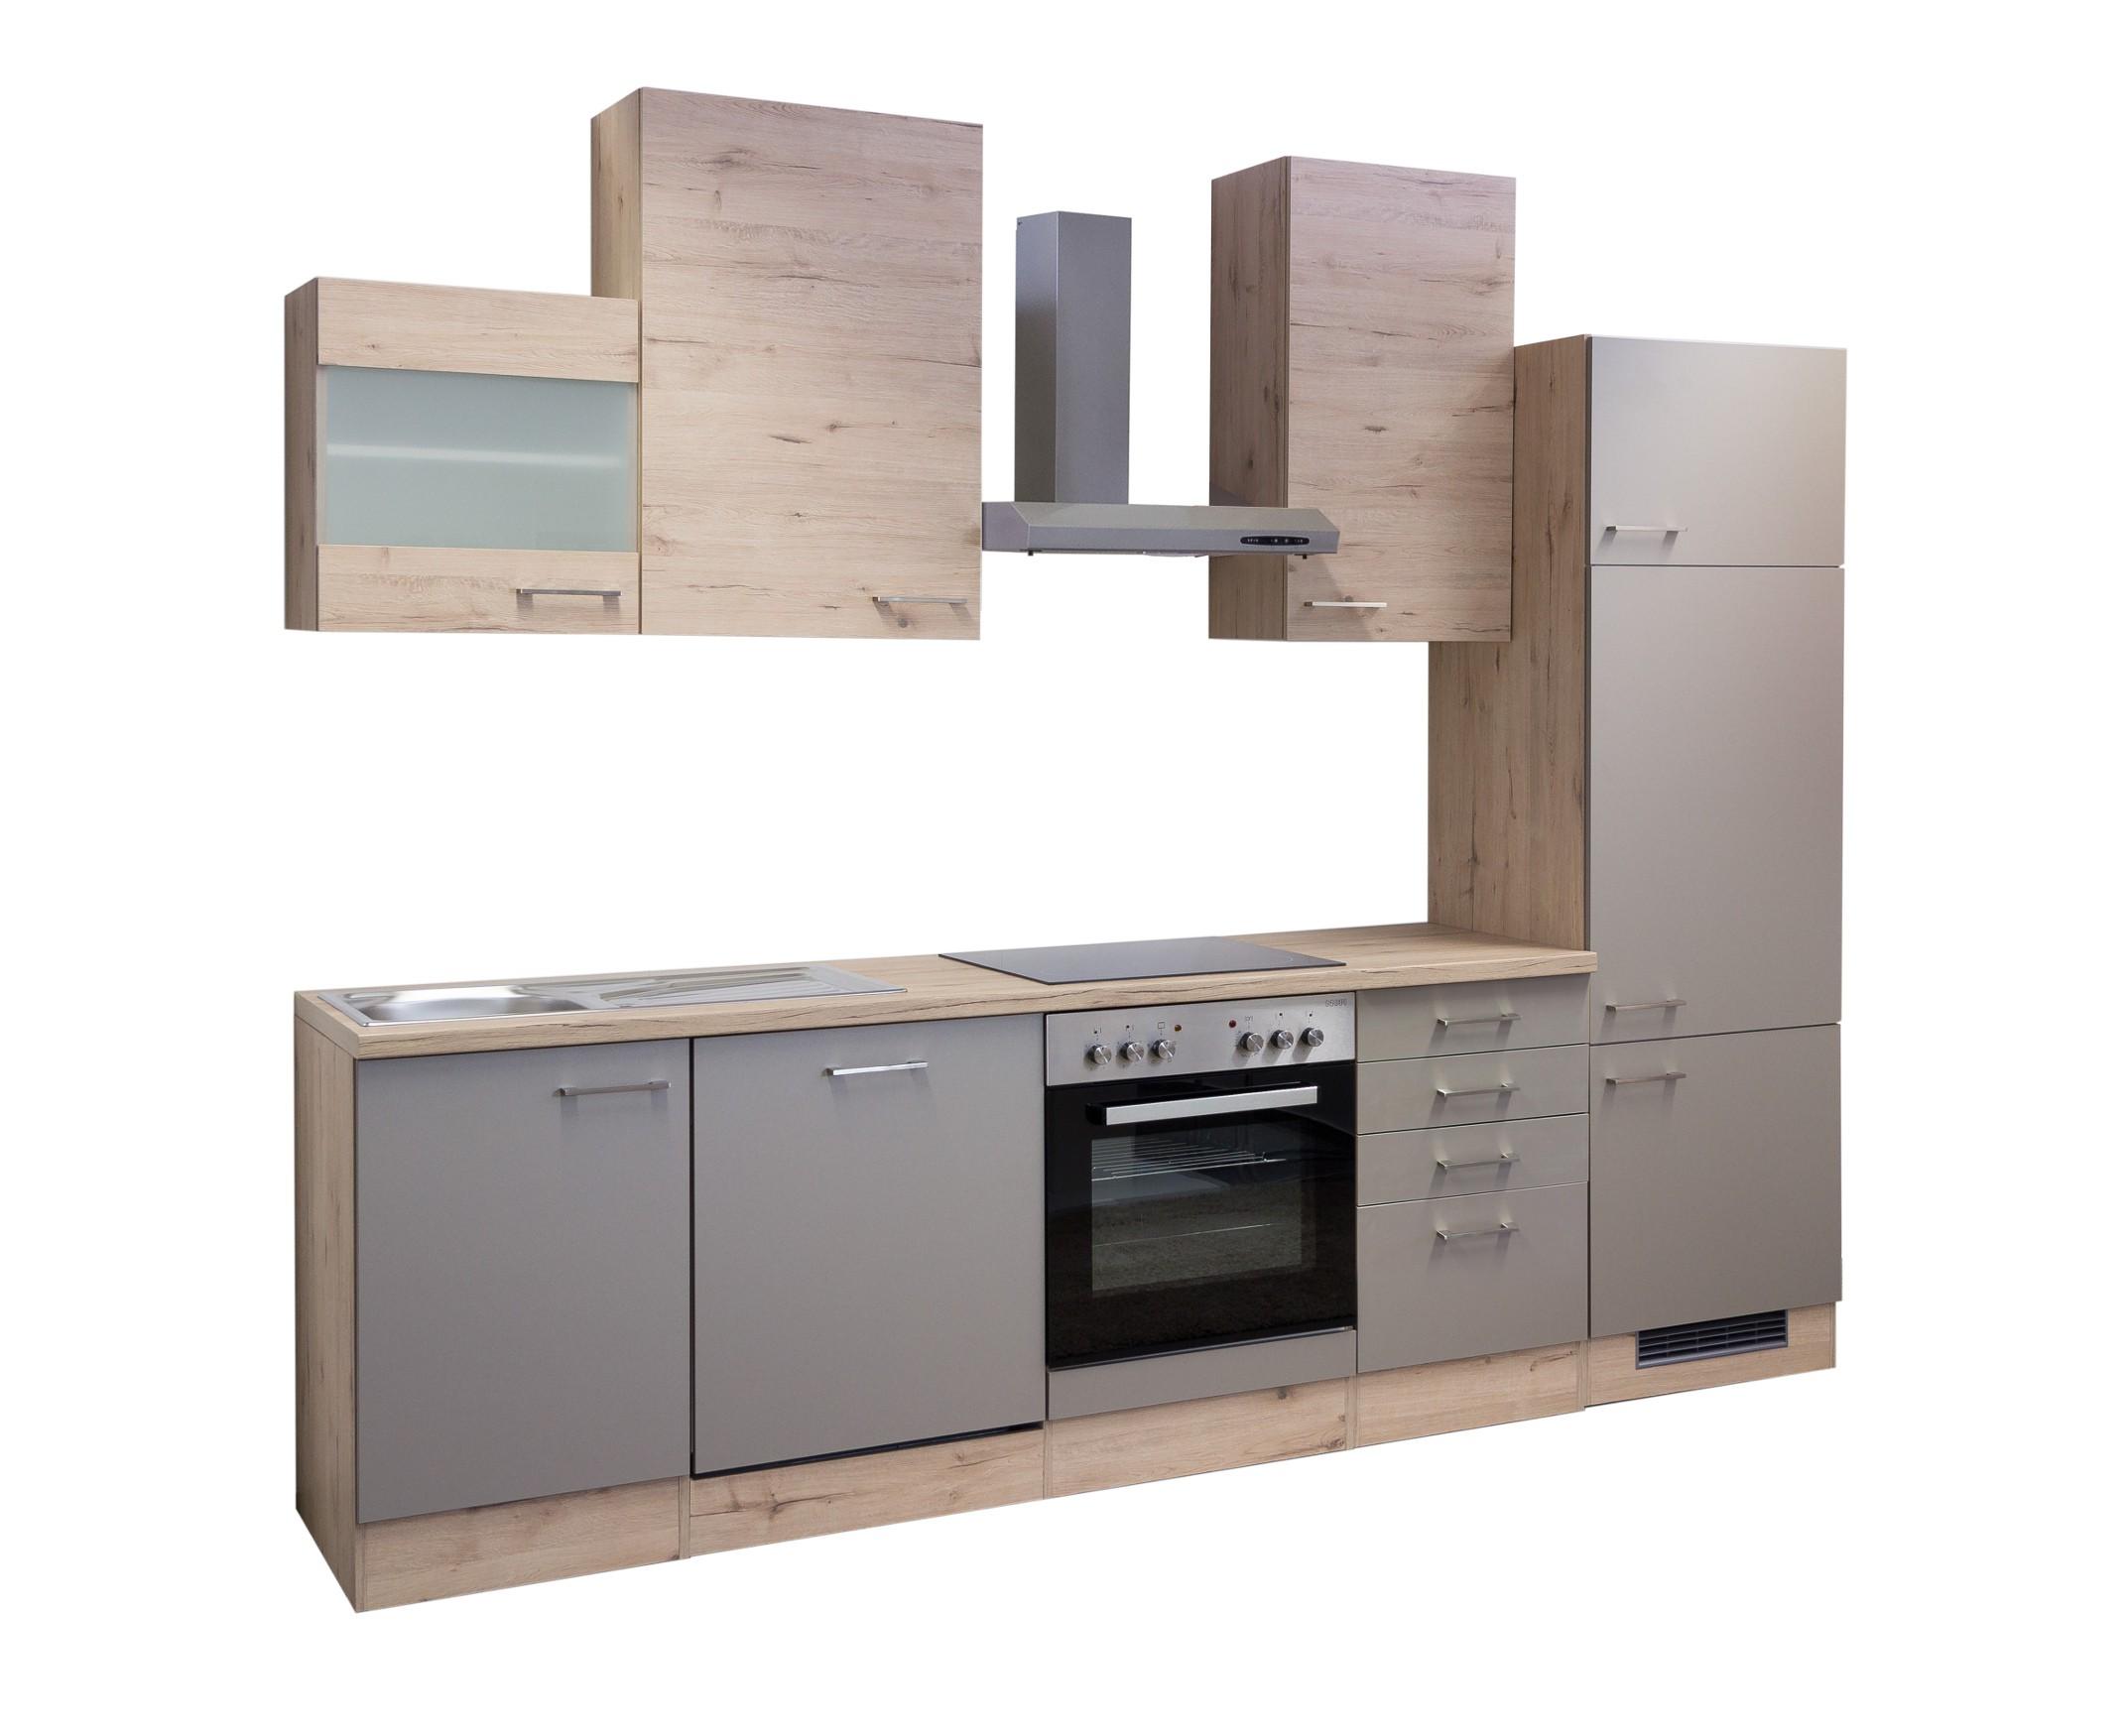 k che riva k chenzeile k chenblock mit elektroger ten 280 cm bronze metallic ebay. Black Bedroom Furniture Sets. Home Design Ideas